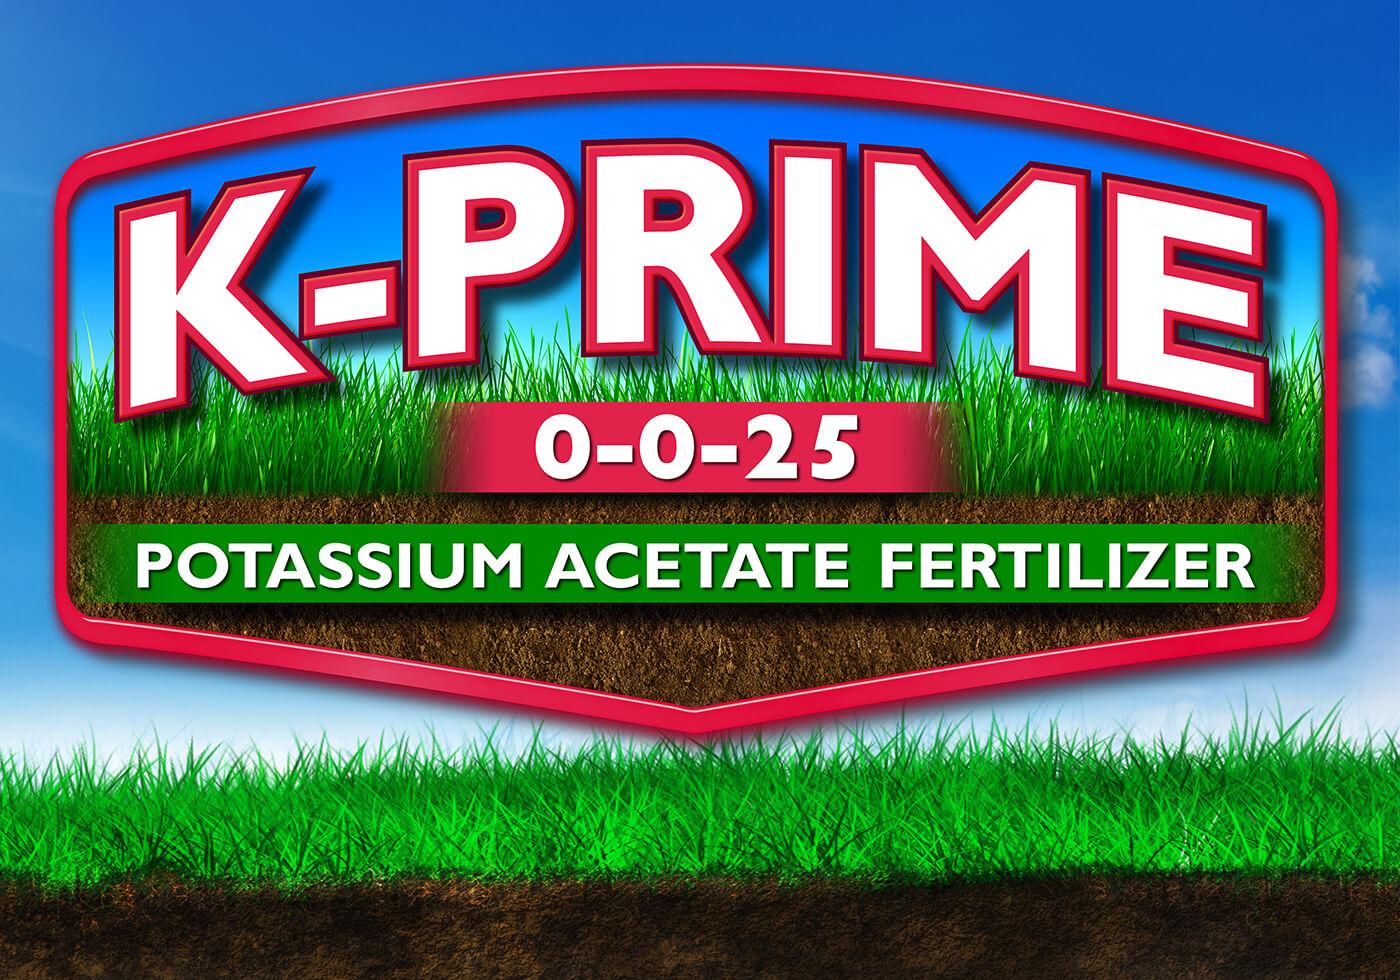 large red k prime 25-0-0 logo potassium acetate fertilizer over blue sky background grass and dirt